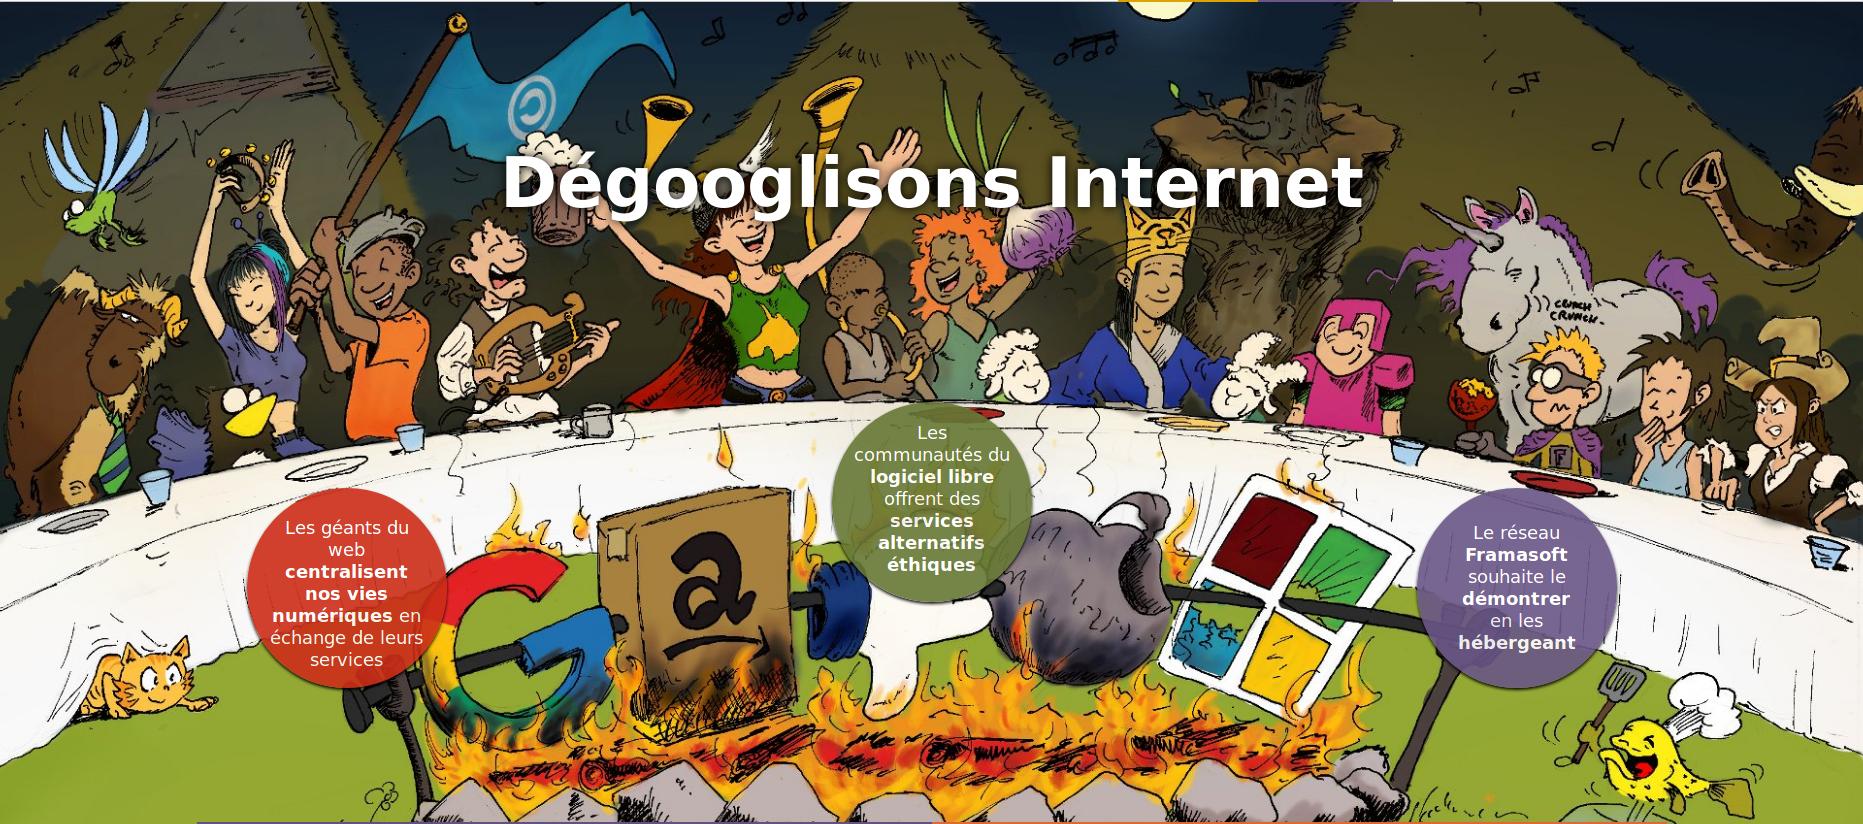 degooglisons l'internet-lien mort